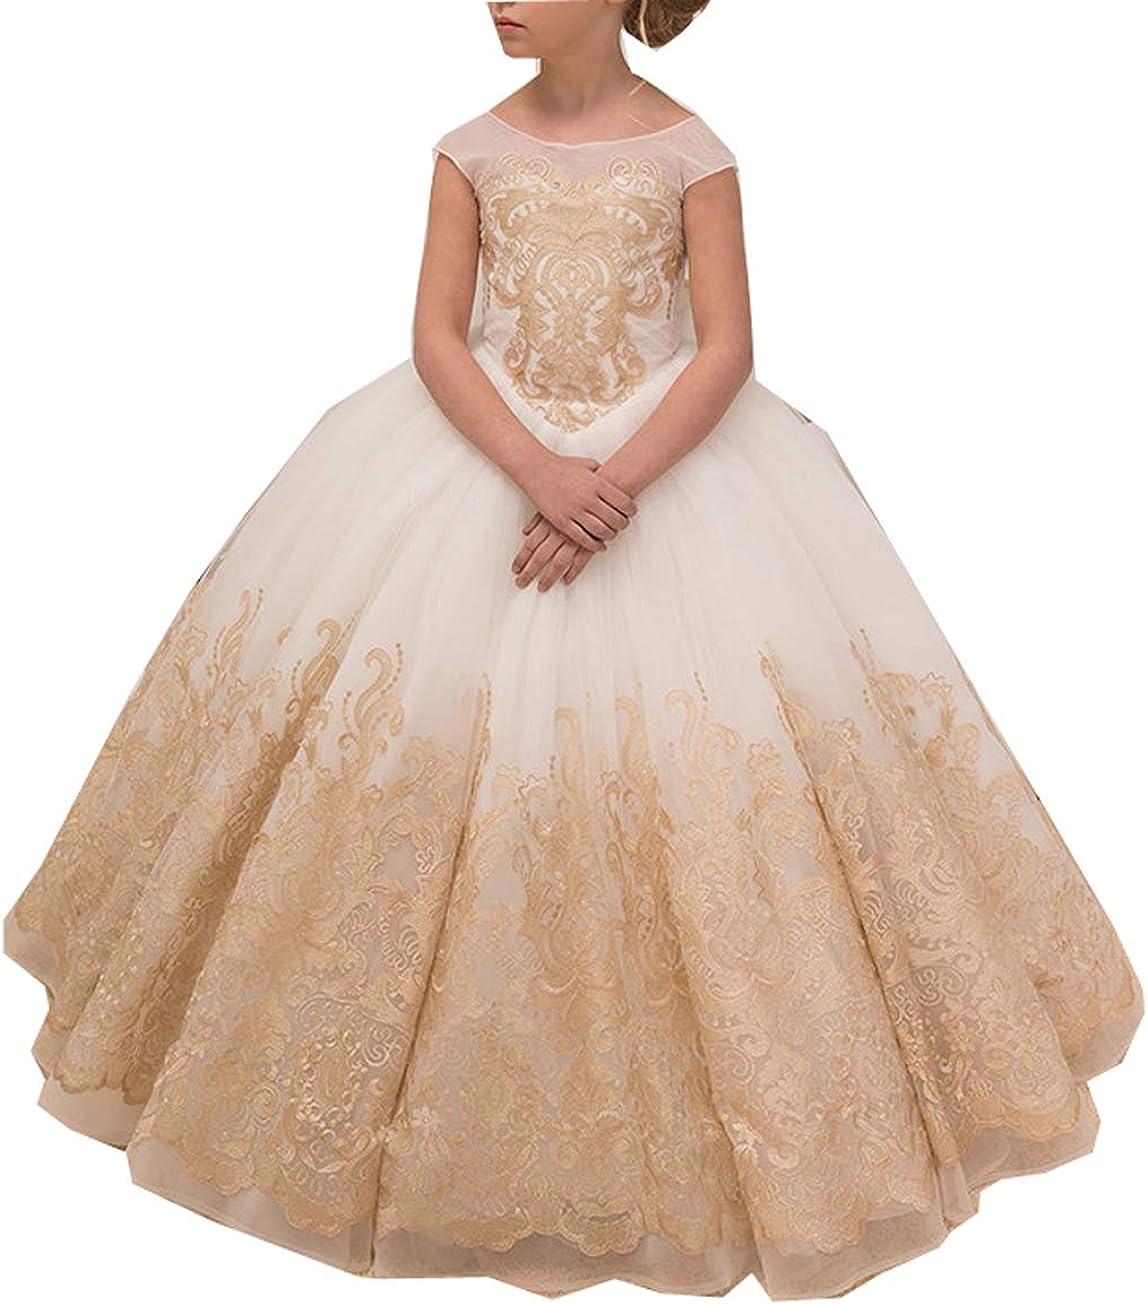 Adela Richer Girls' Lace High Denver Mall Go Dresses Neck Popular Pageant Ball